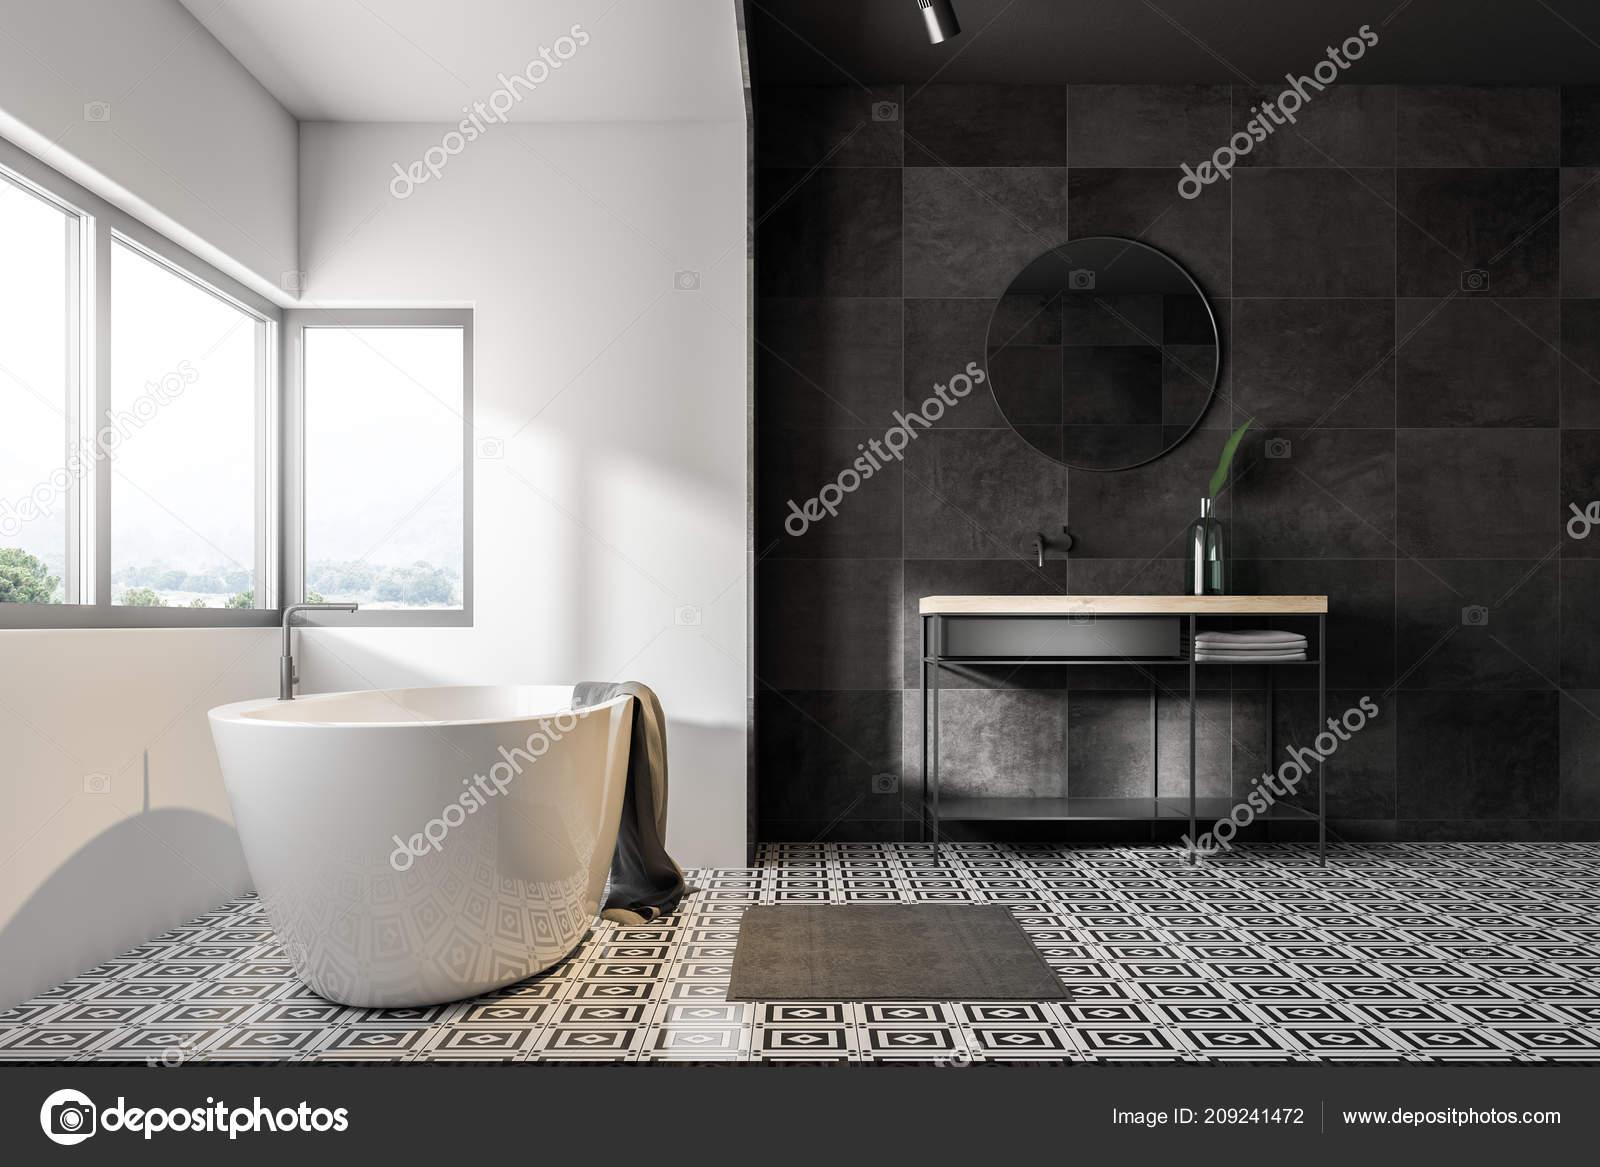 Badezimmer Interieur Mit Grauen Fliesen Wande Fliesenboden